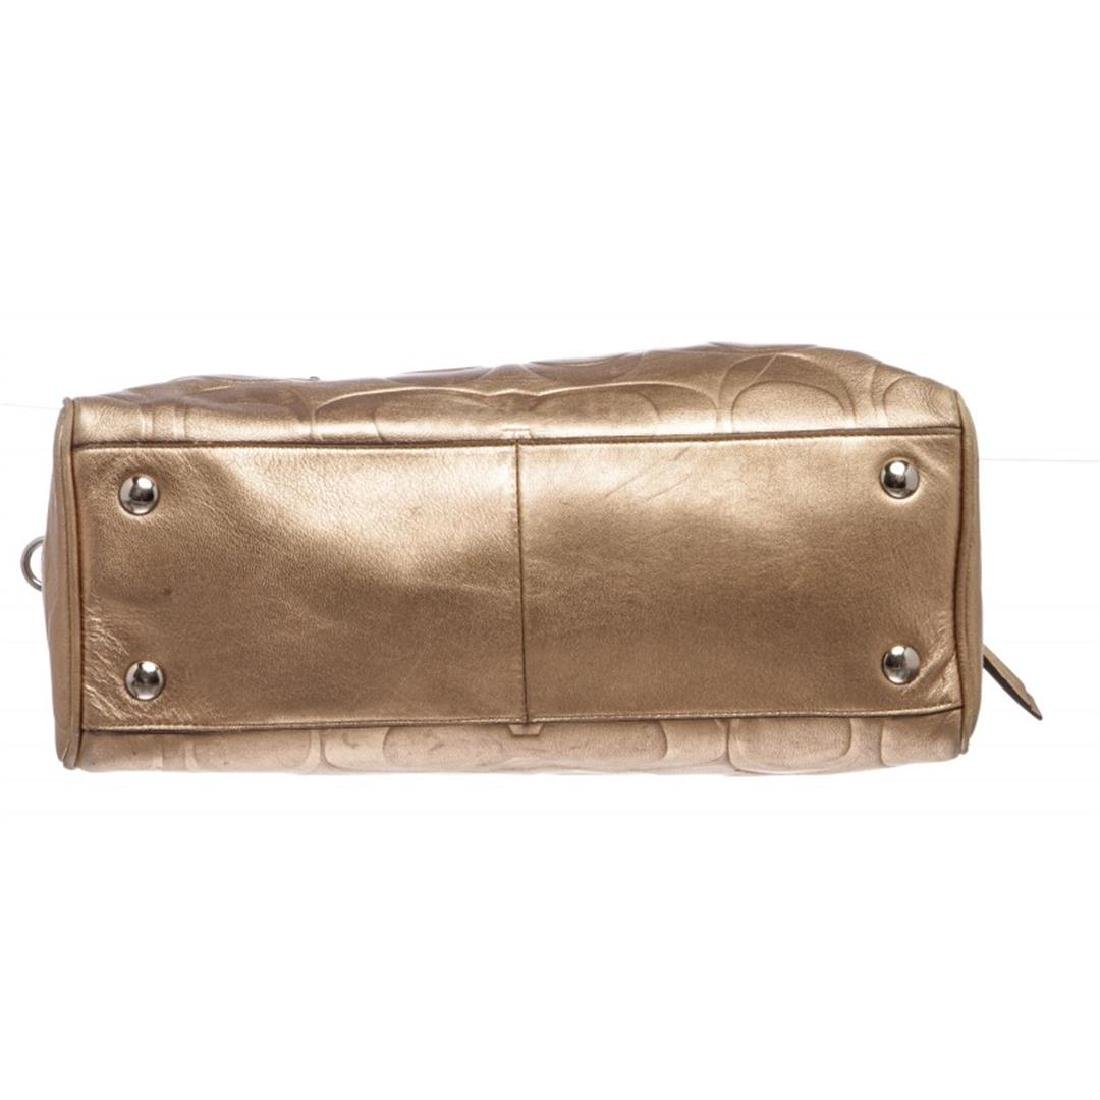 Coach Metallic Gold Monogram Leather Tote Bag - 4